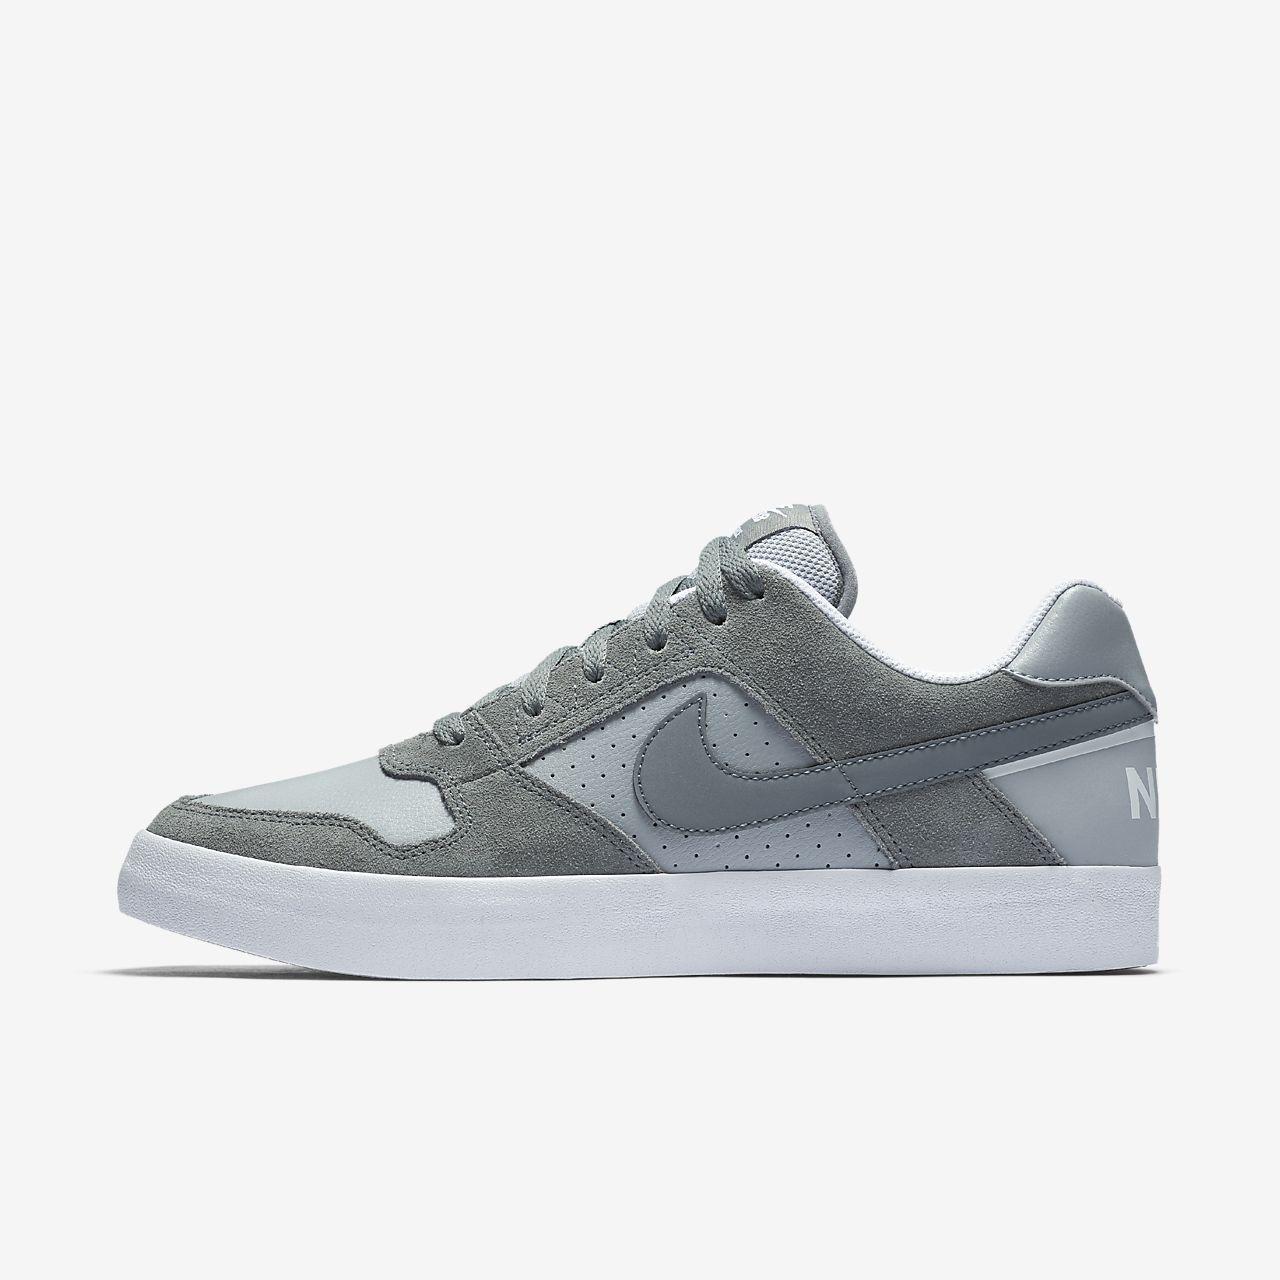 ... Nike SB Delta Force Vulc Men's Skateboarding Shoe